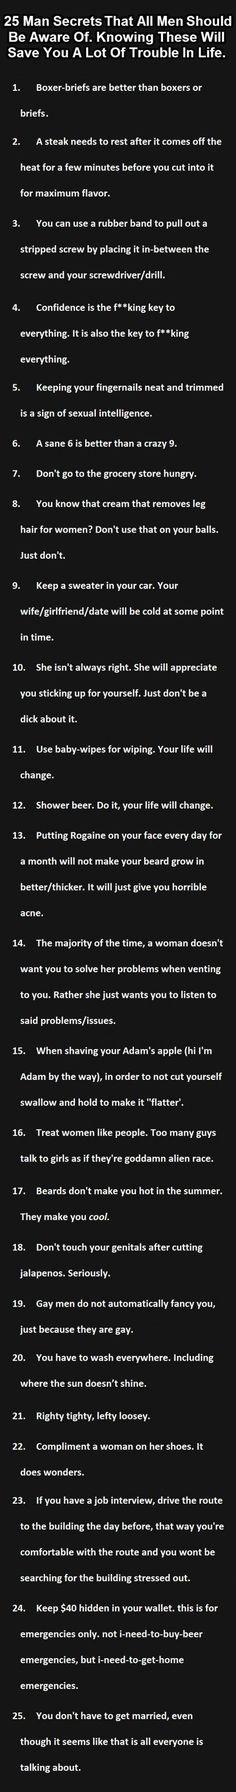 25 Man Secrets